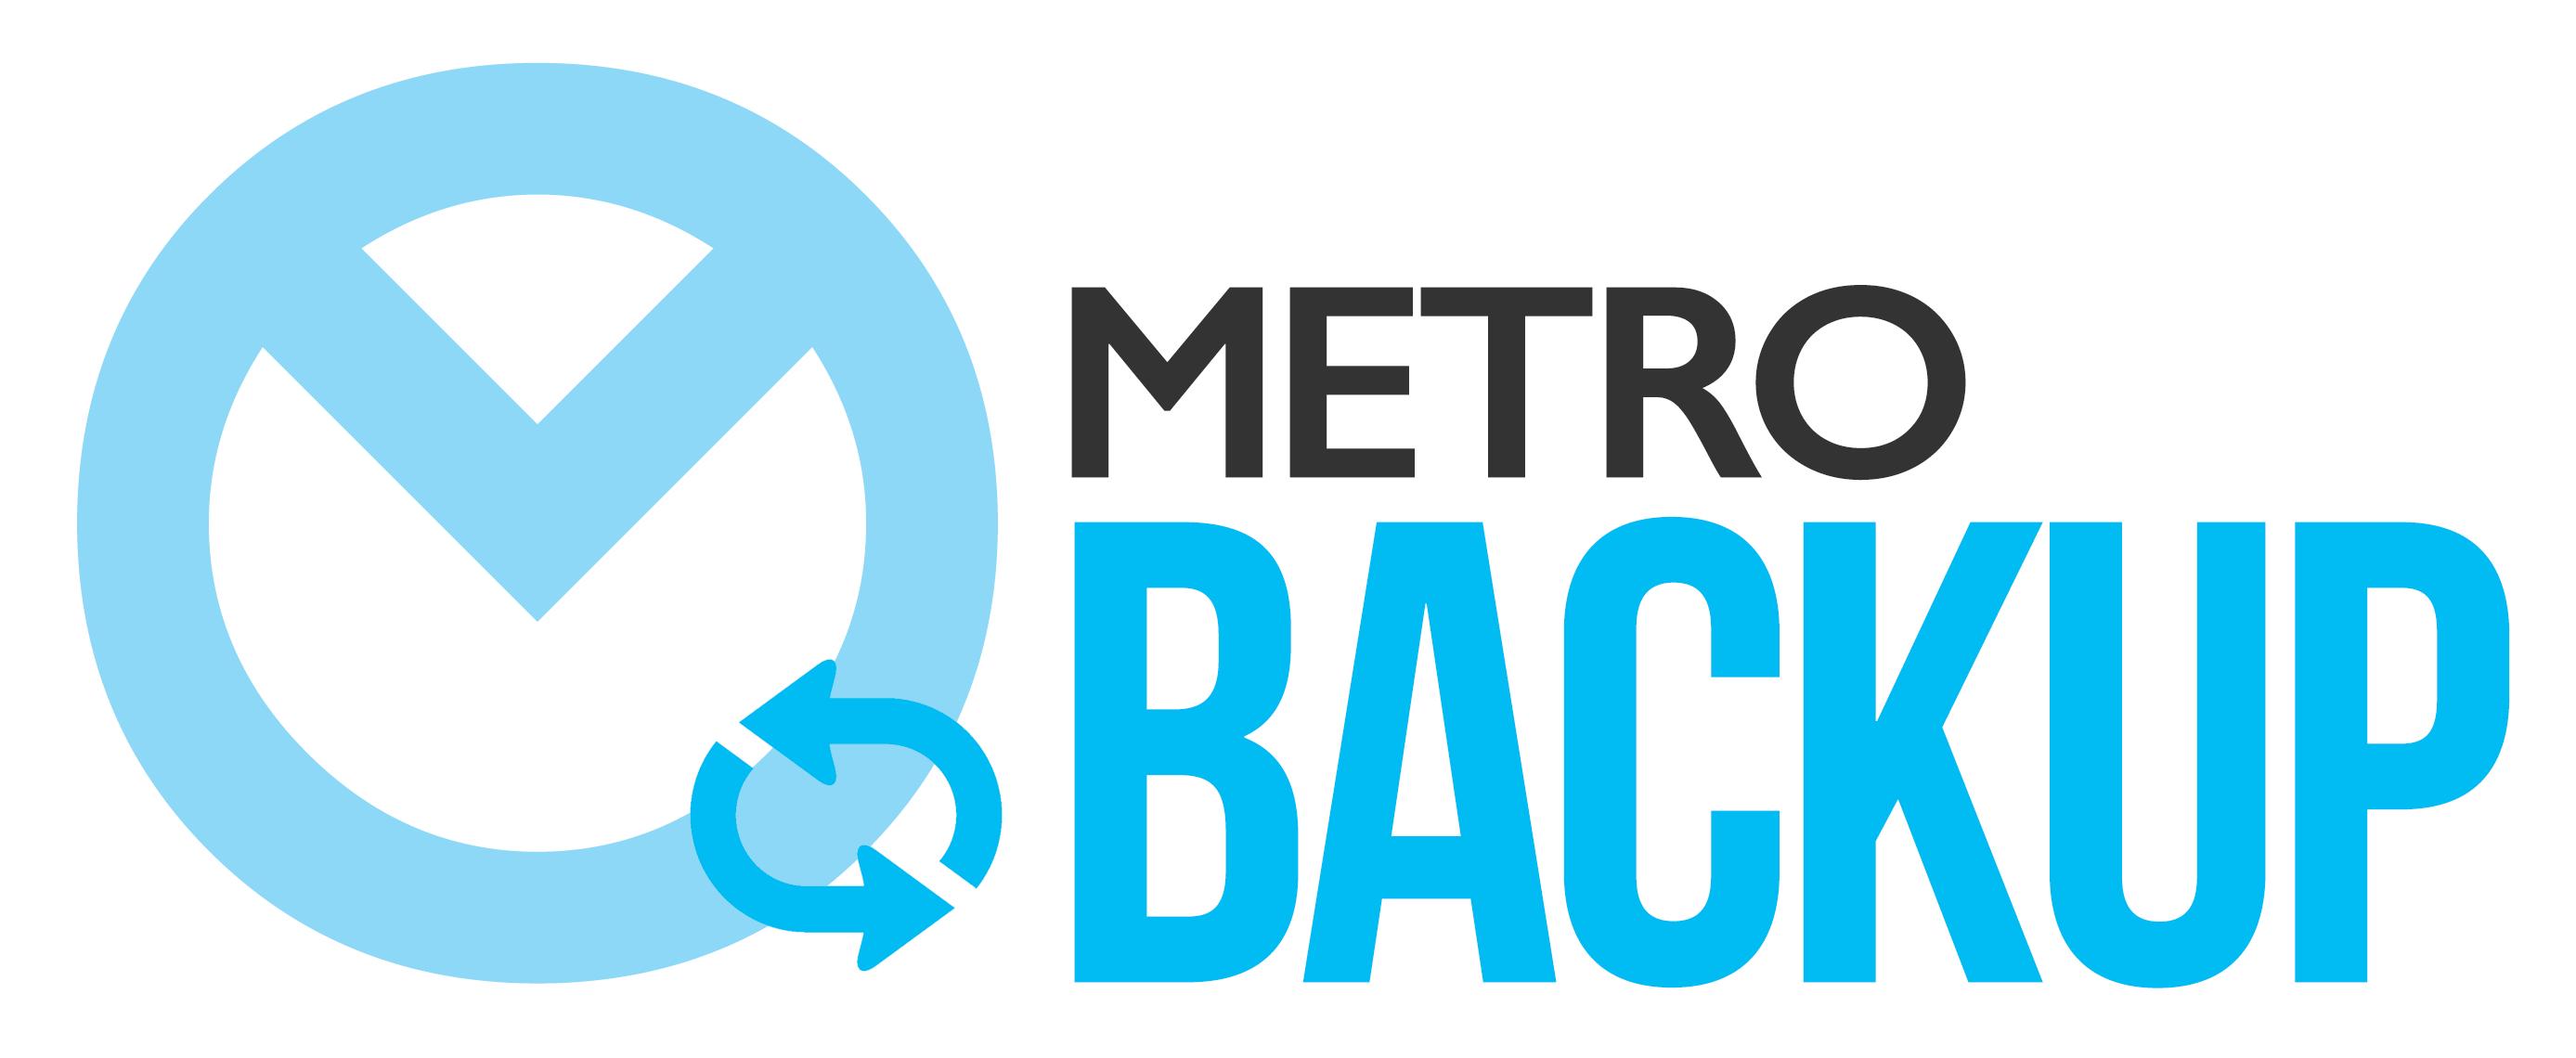 MetroBackup from Digital West